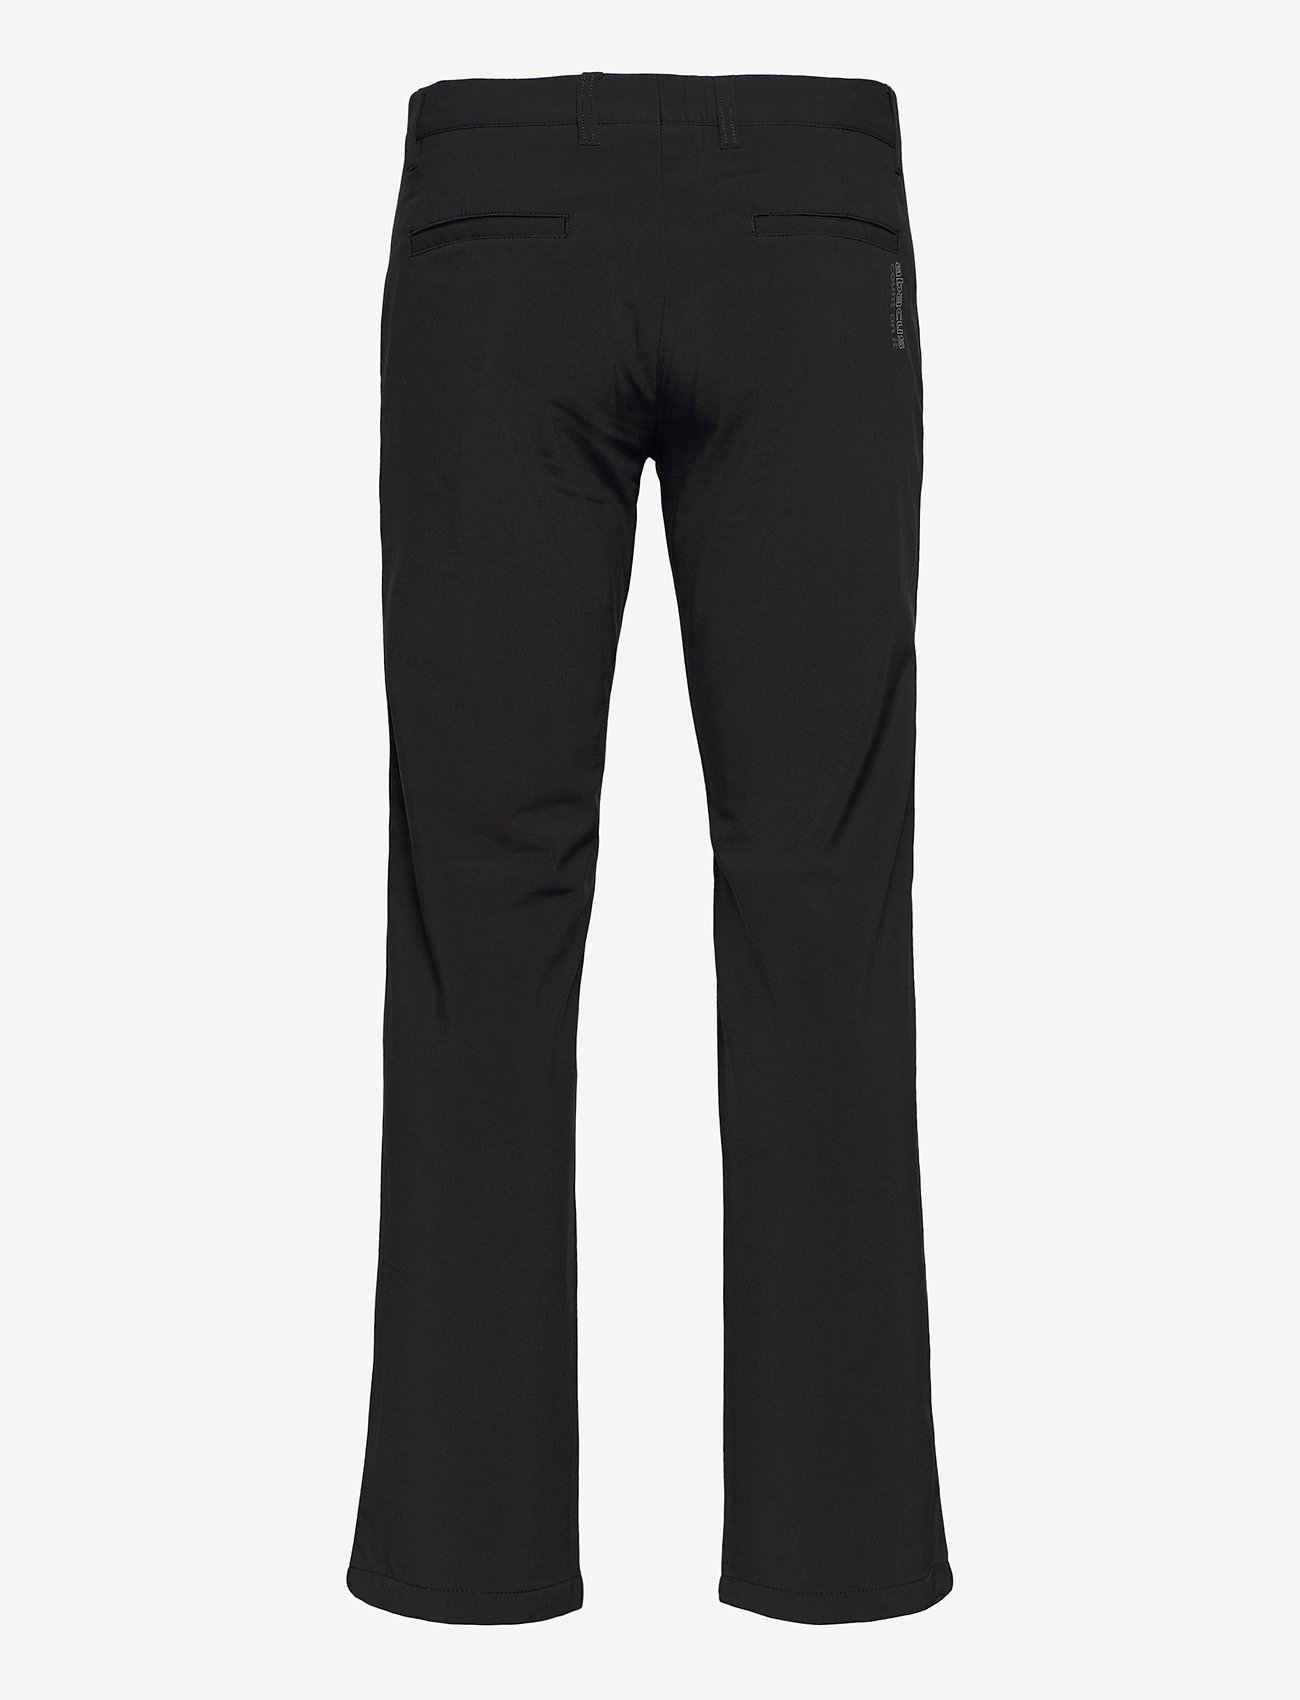 Abacus - Mens Robin trousers - golf-housut - black - 1